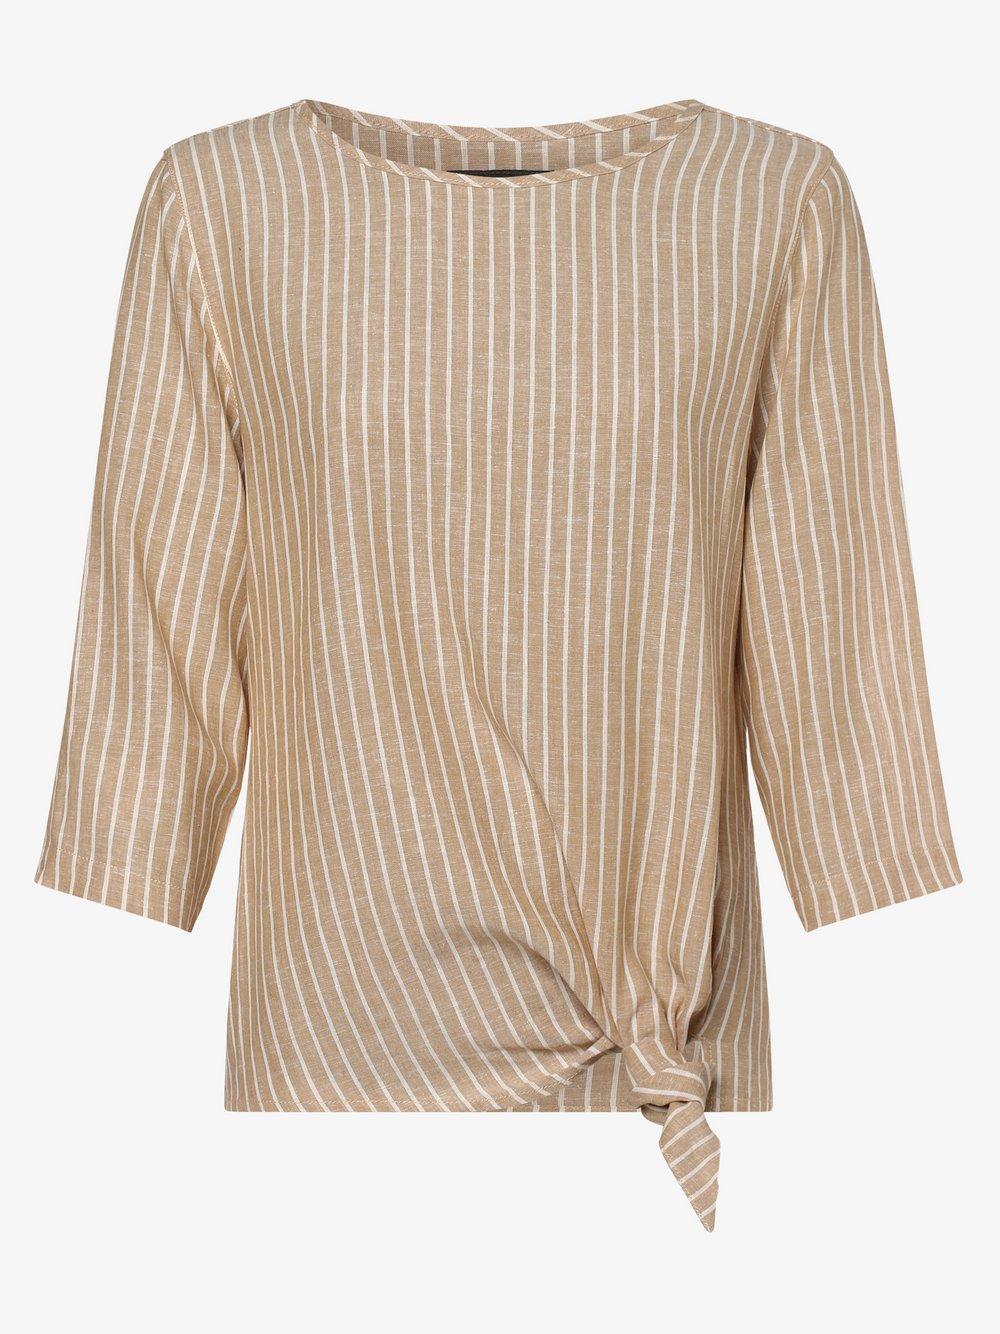 Franco Callegari – Bluzka damska z dodatkiem lnu, beżowy Van Graaf 470647-0001-00400